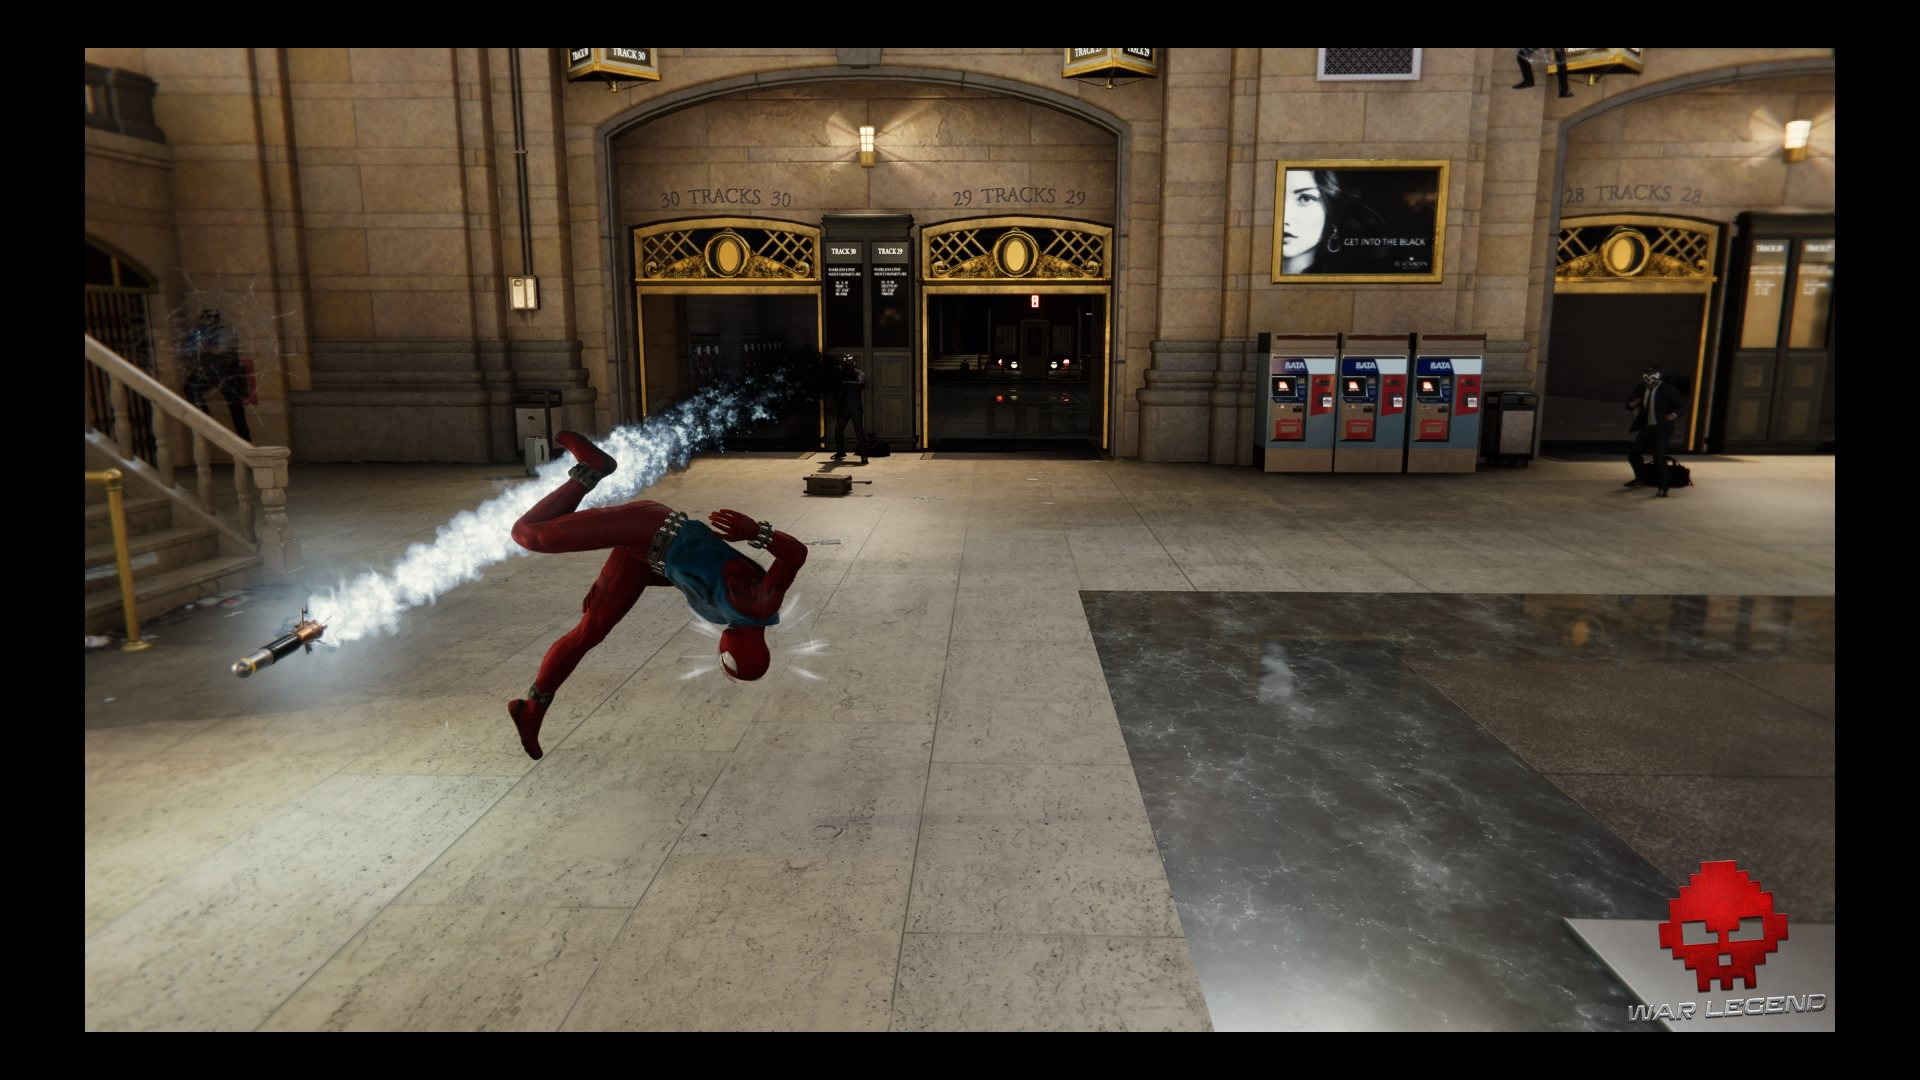 Spider-Man esquive une roquette